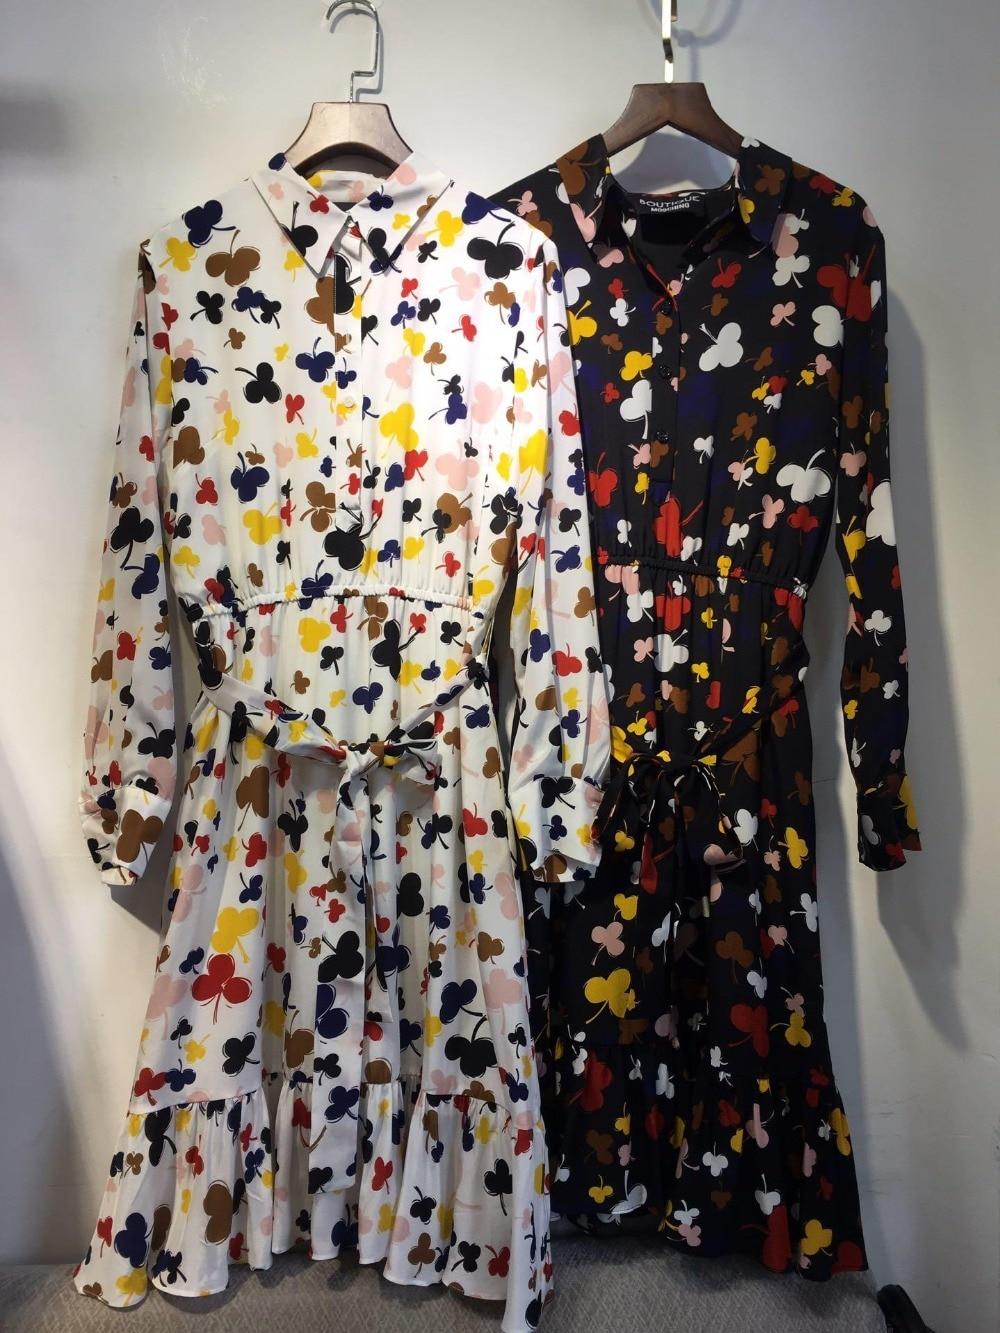 2019 high quality ladies silk printed belt long sleeve belt female elegant dress 0313